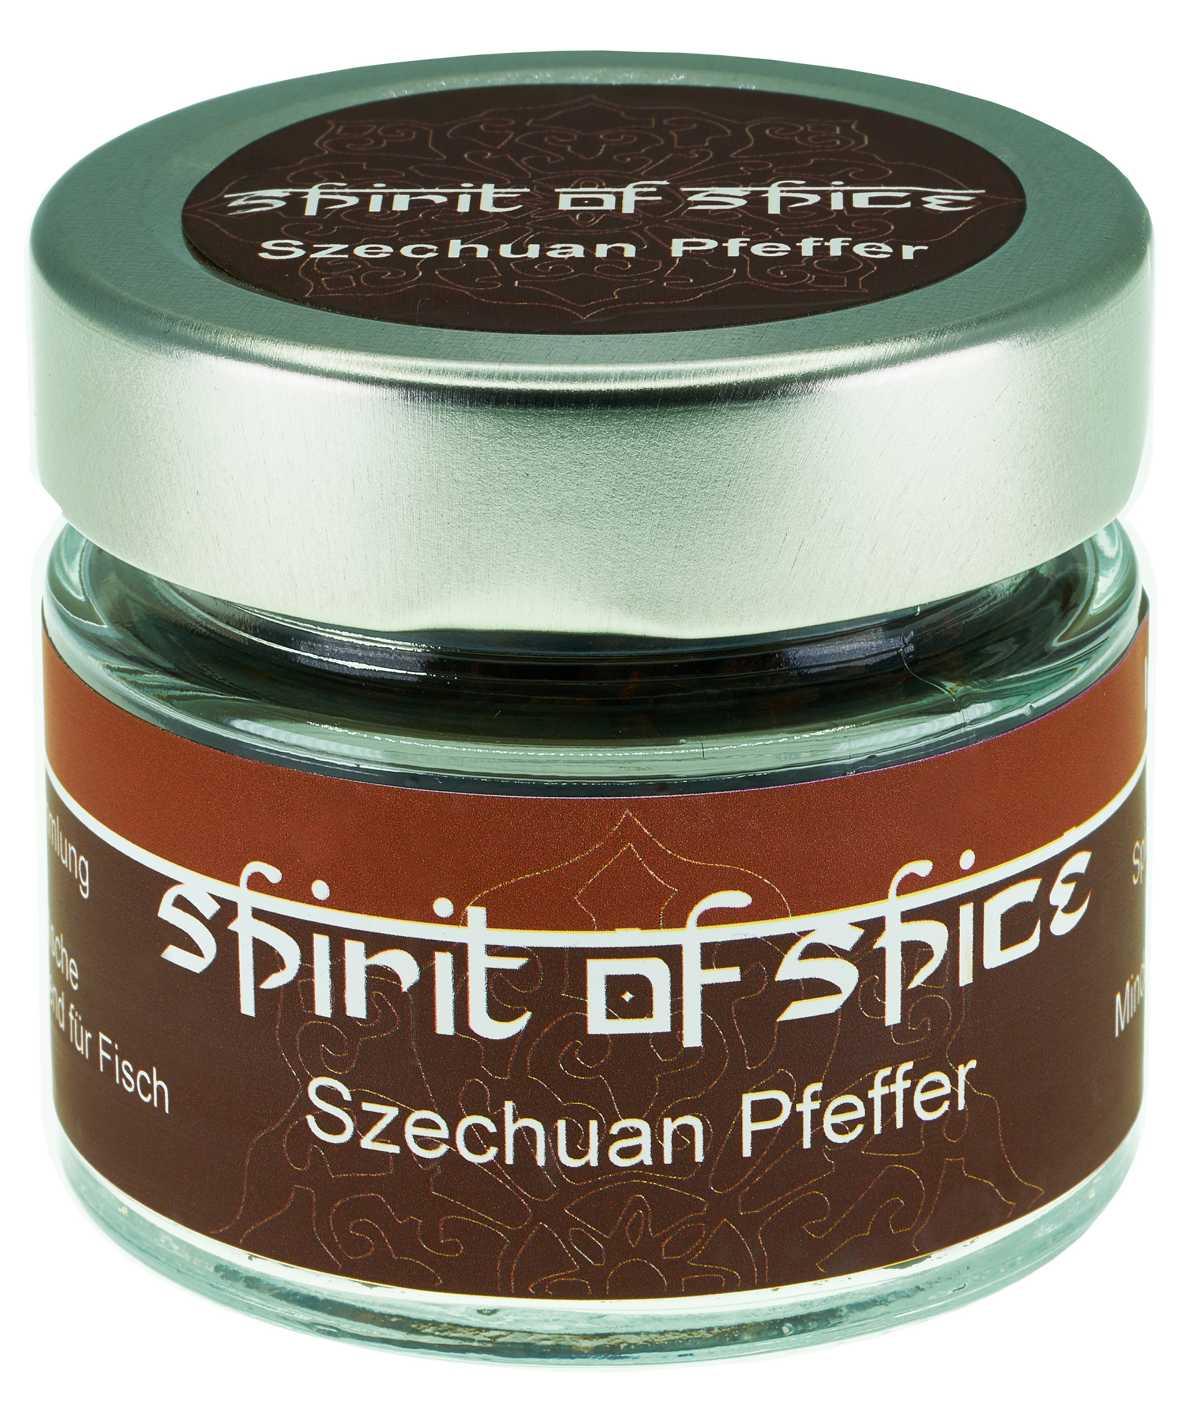 Szechuan-Pfeffer aus Nepal/Himalaya